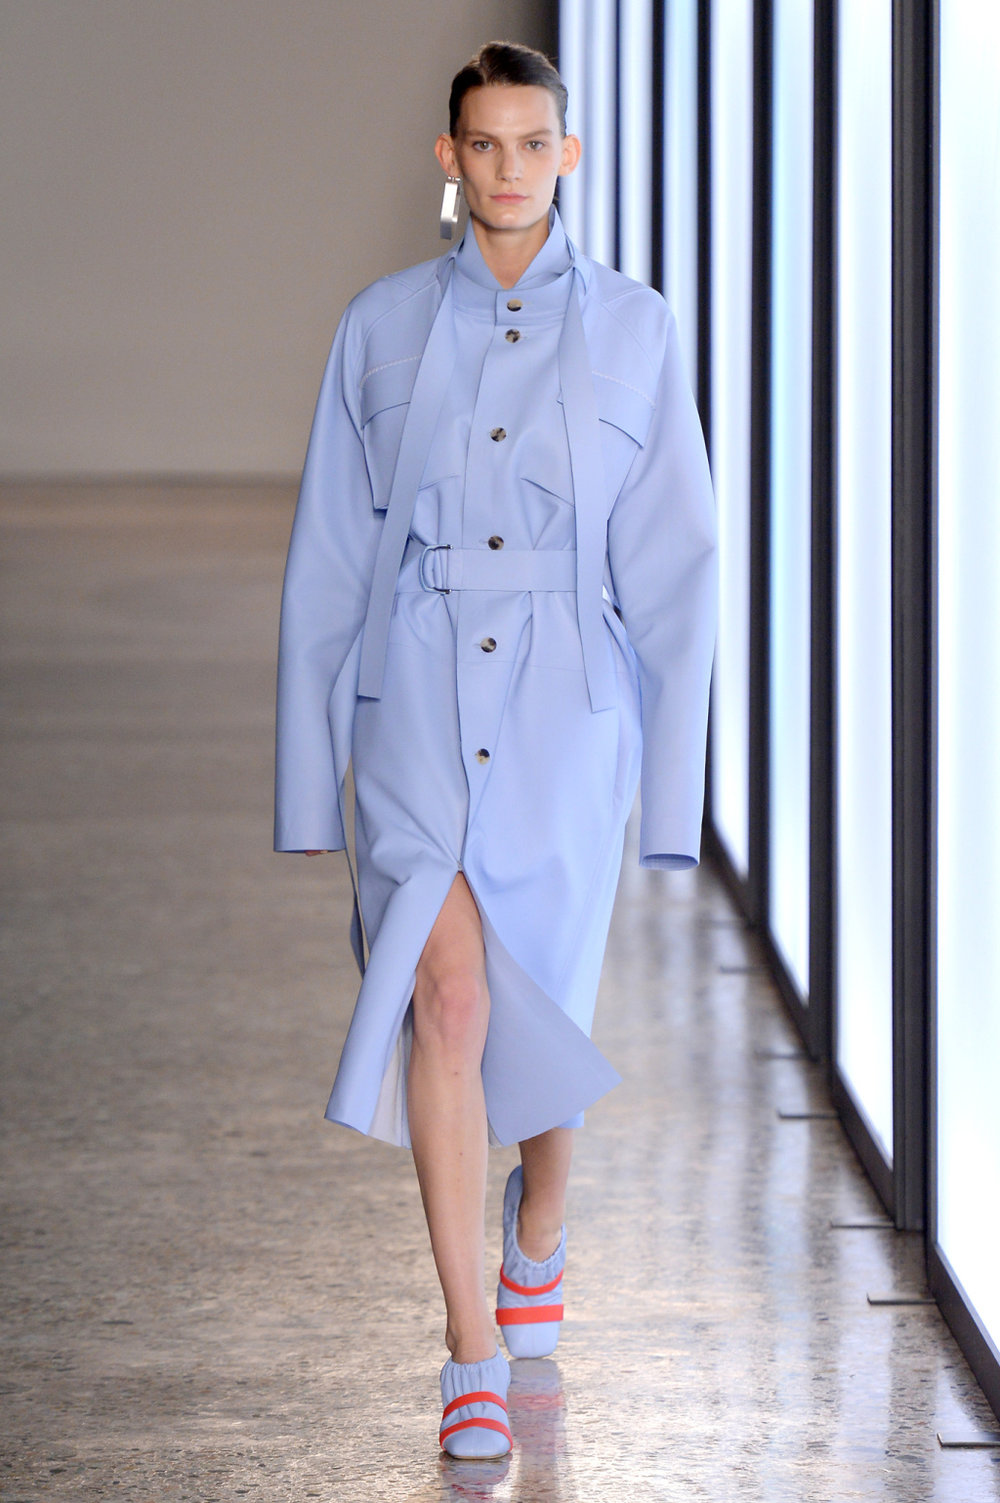 gabriele-colangelo-rtw-spring-2018-milan-fashion-week-mfw-001.jpg